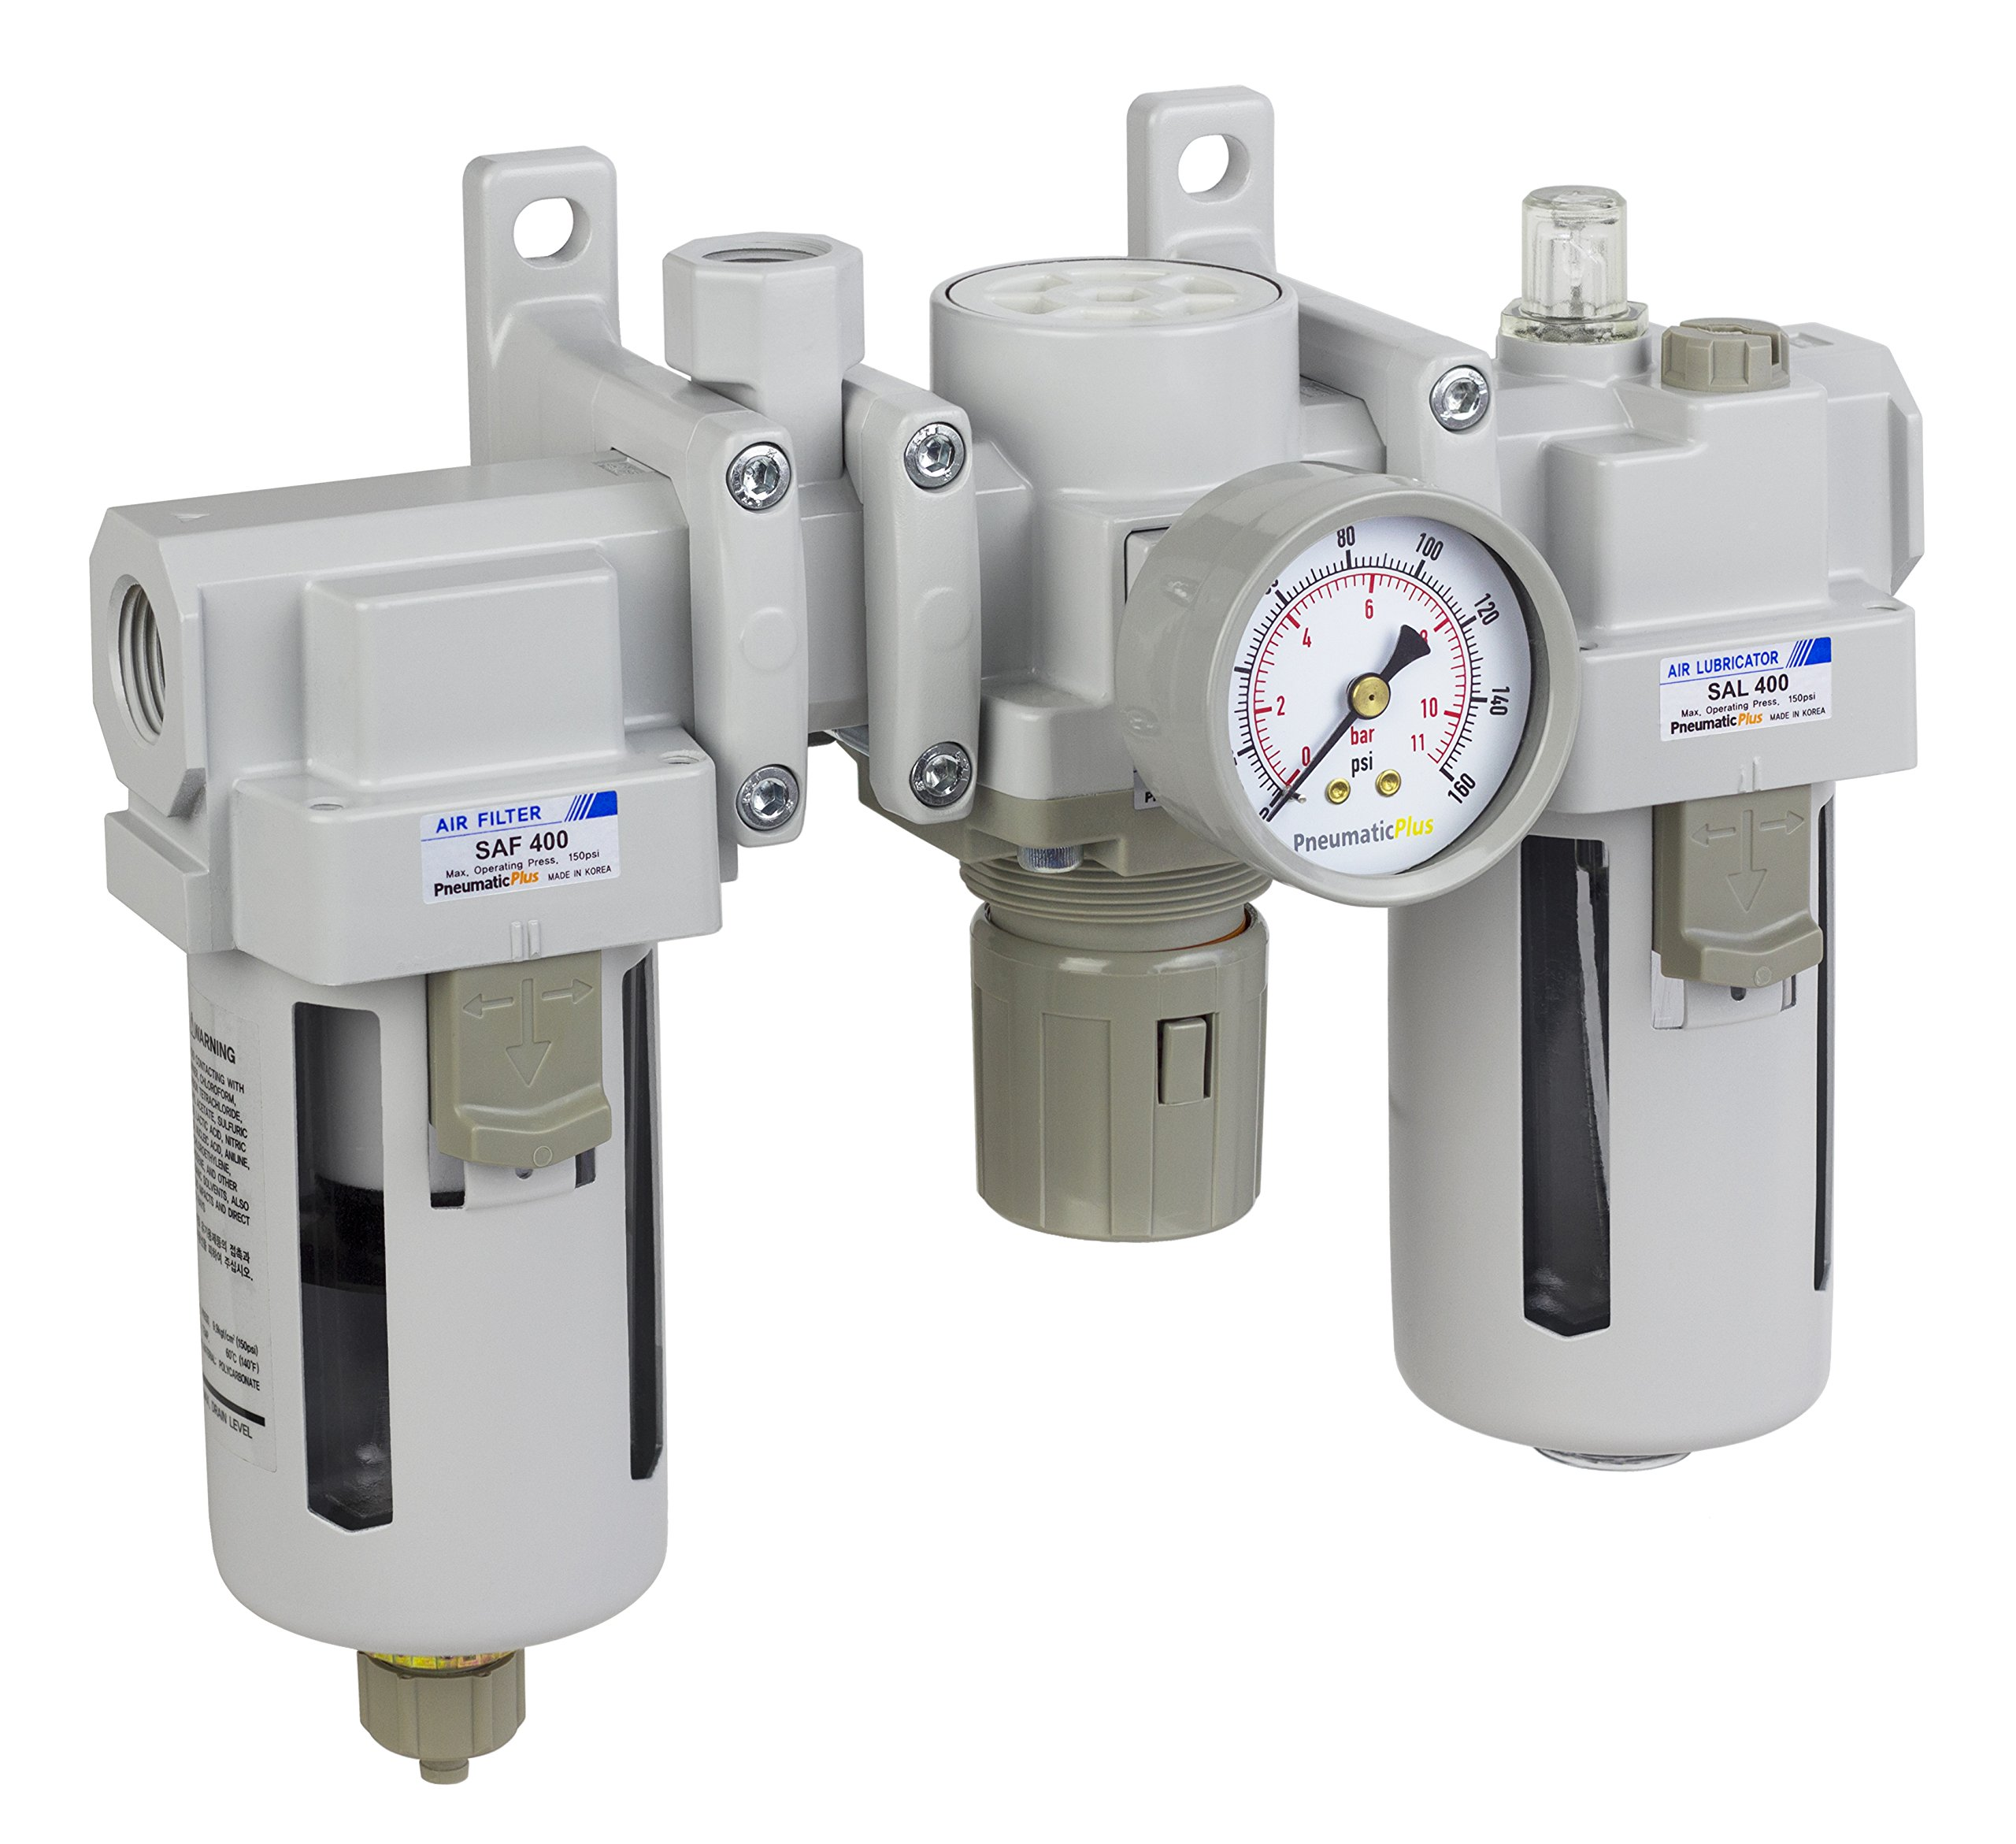 PneumaticPlus SAU400A-N04G - Dual Air System 1/2'' NPT - Air Filter, Regulator & Lubricator w/Additional Free Air Port 3/8'' NPT - Manual Drain, Poly Bowl, Pressure Gauge by PneumaticPlus